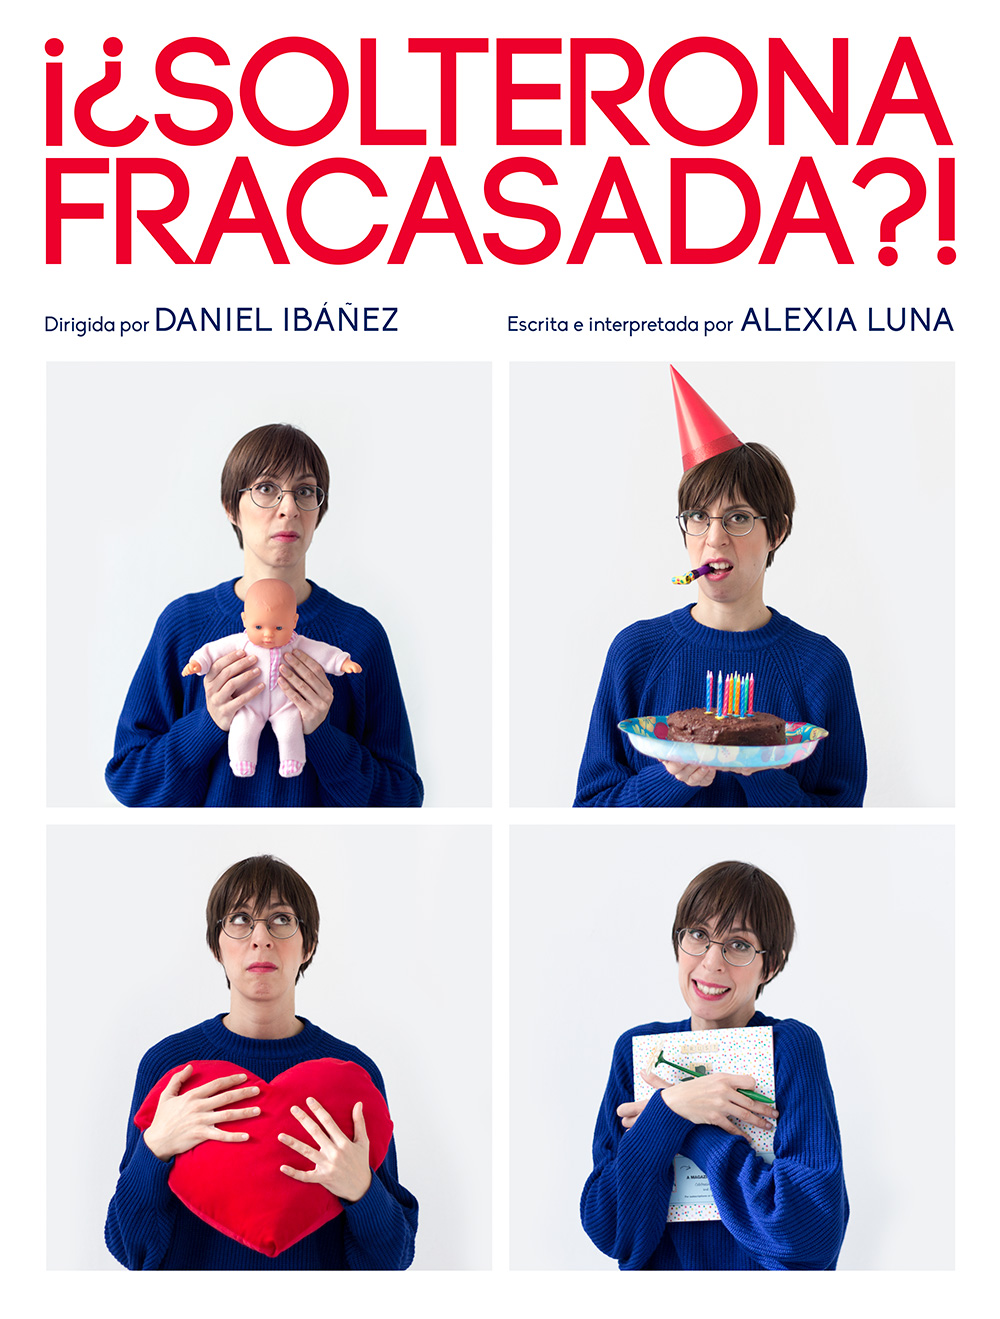 Solterona Fracasada -Diseño póster teatro